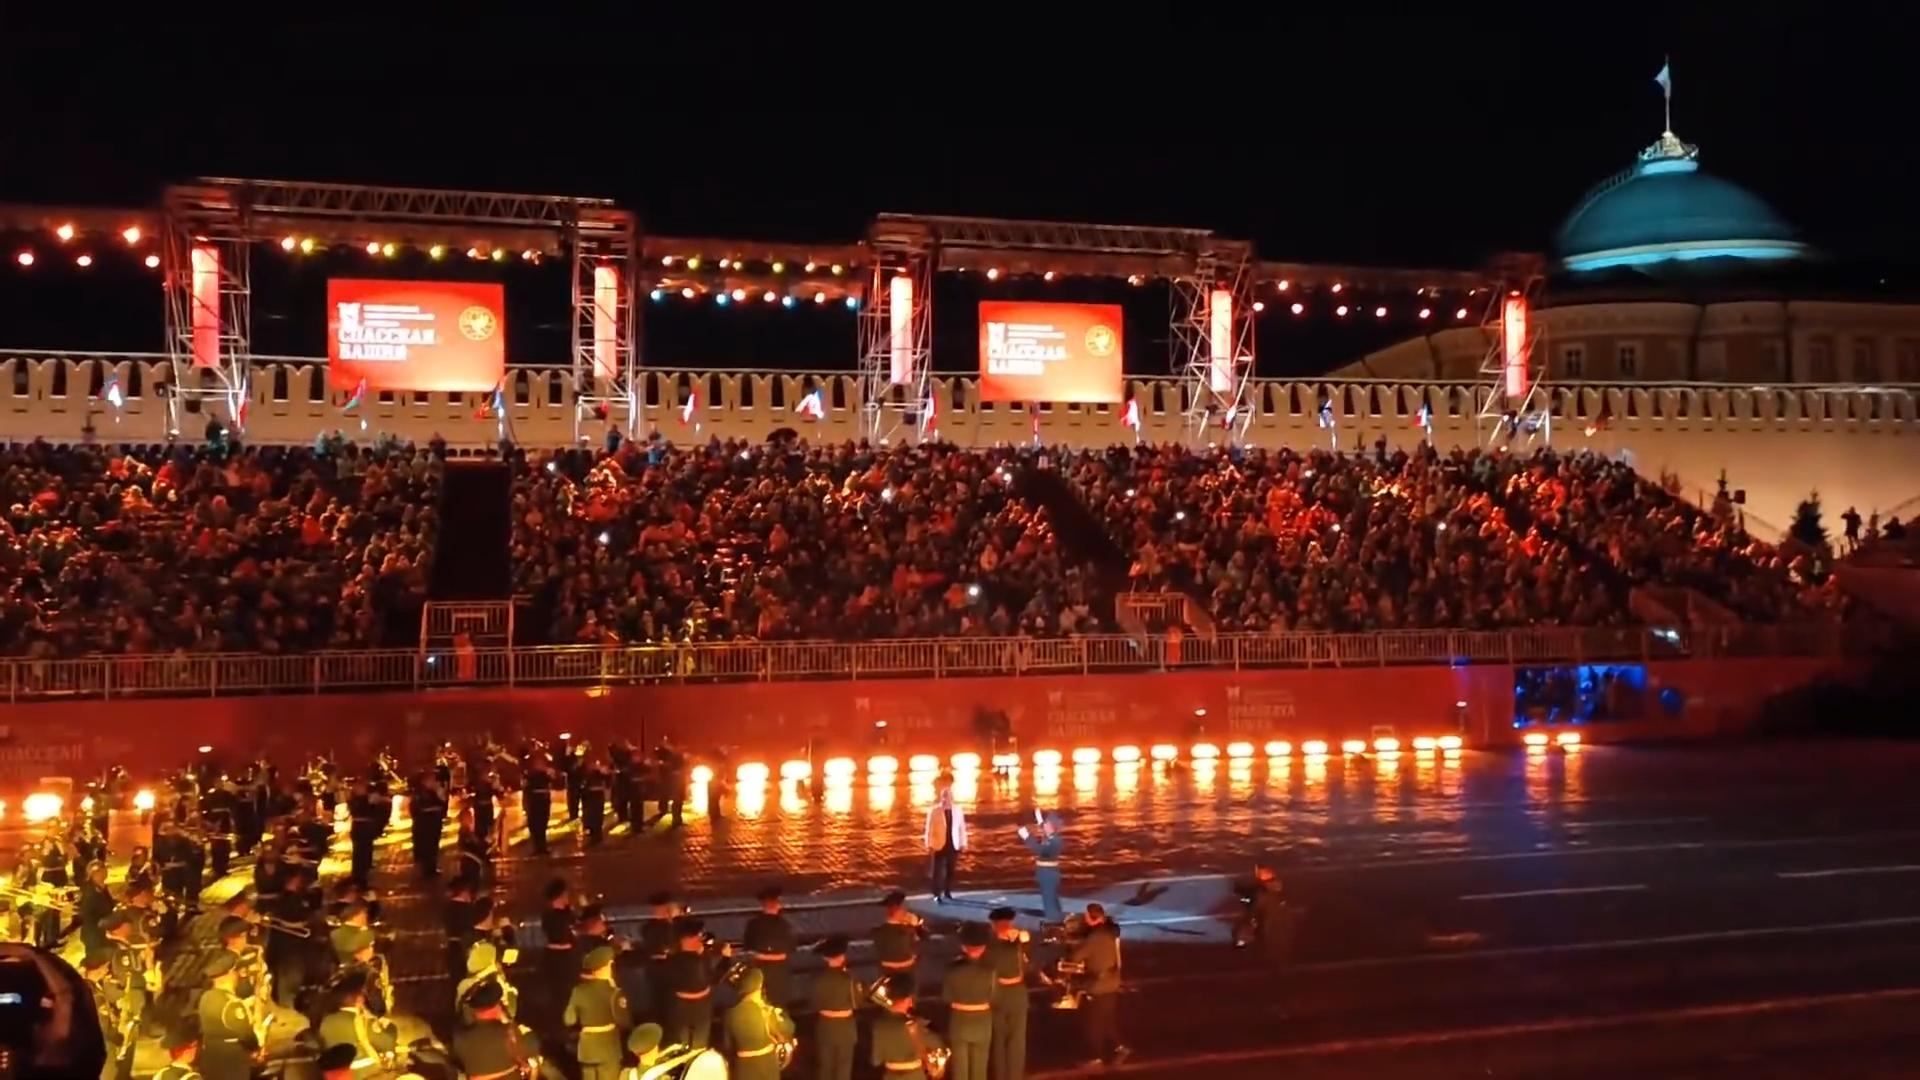 20210905-Тилль Линдеманн на Международном Фестивале Спасская Башня в Москве 05.09.2021-scr3